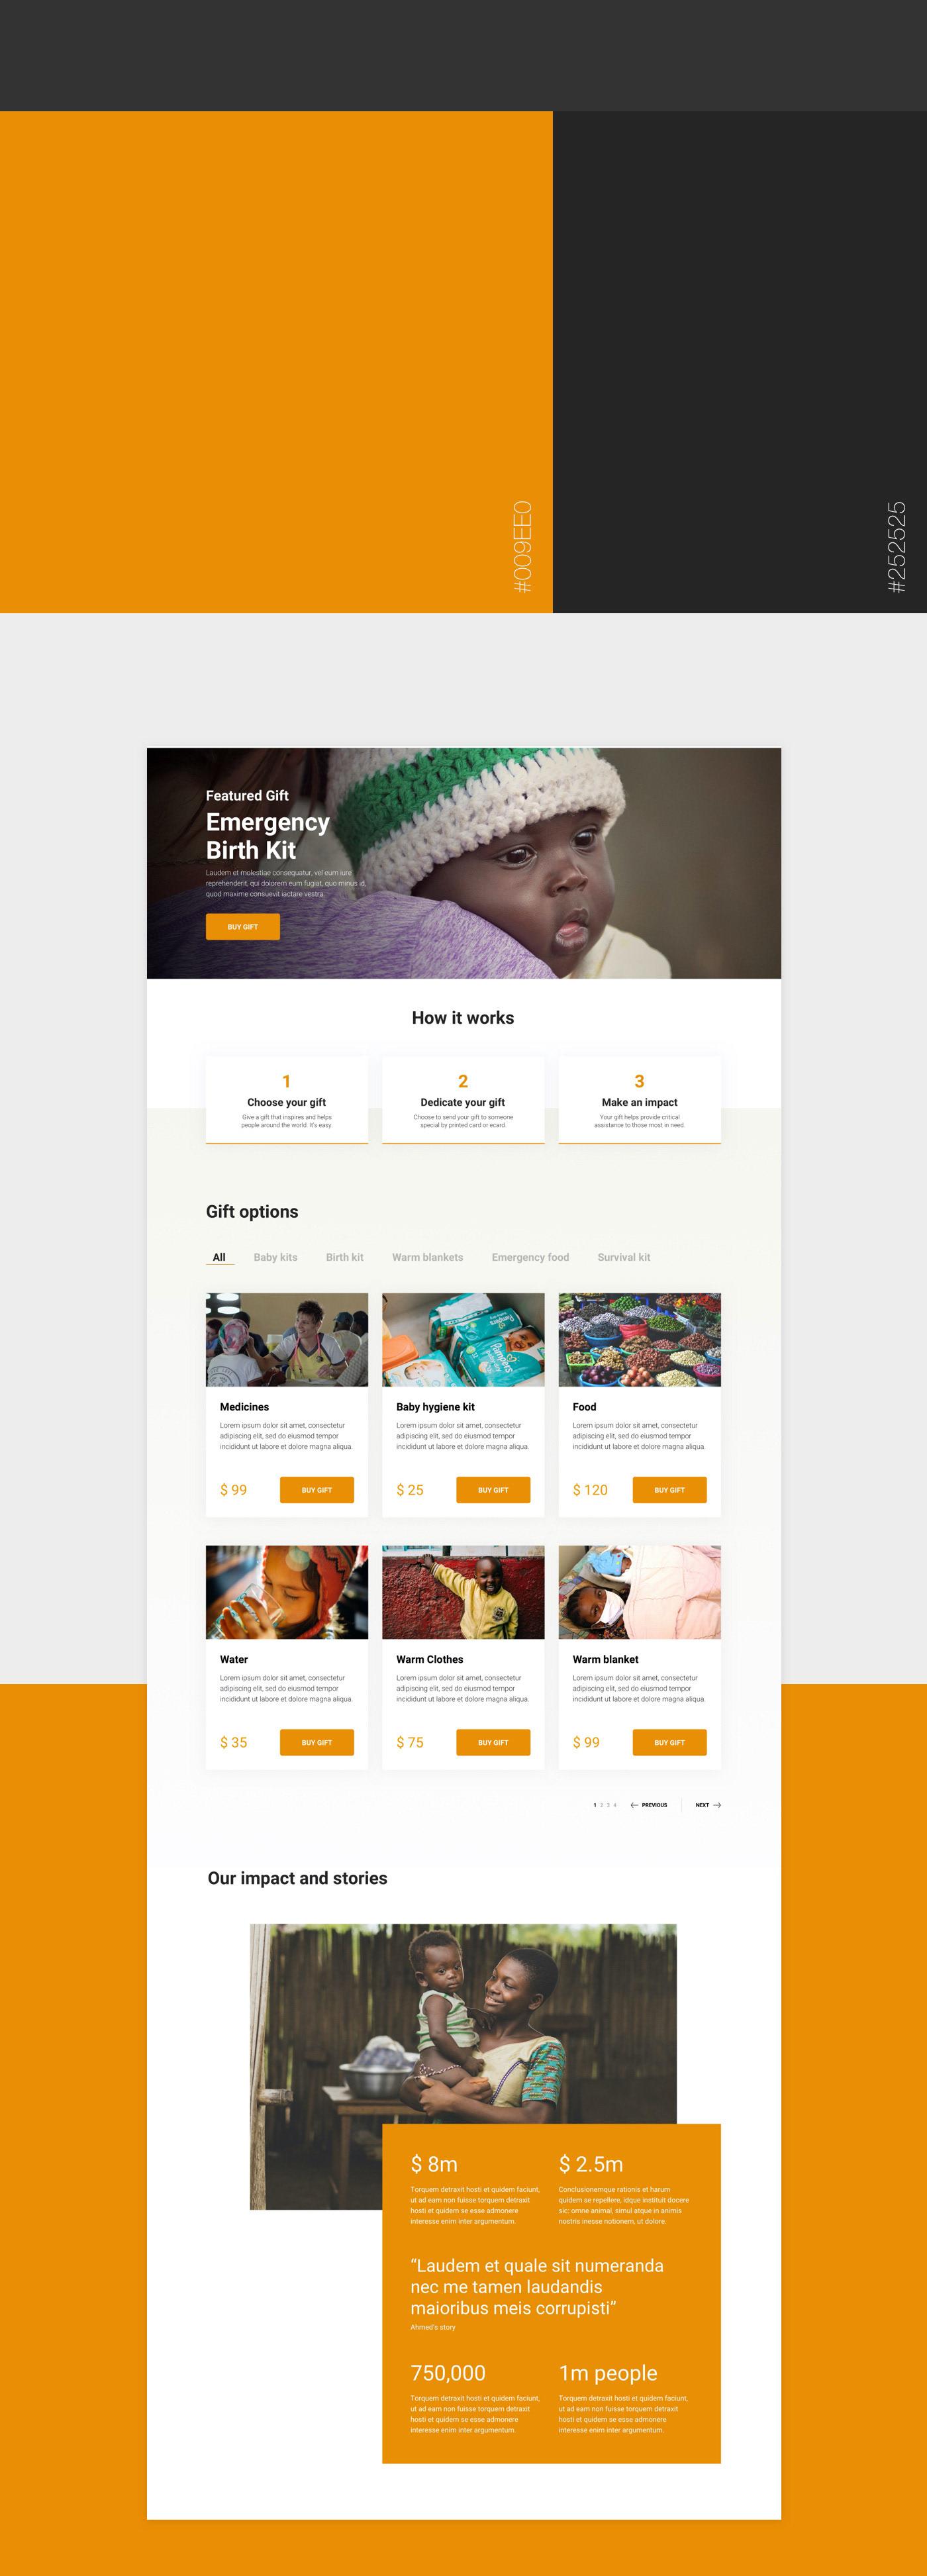 design digital UI Web Webdesign